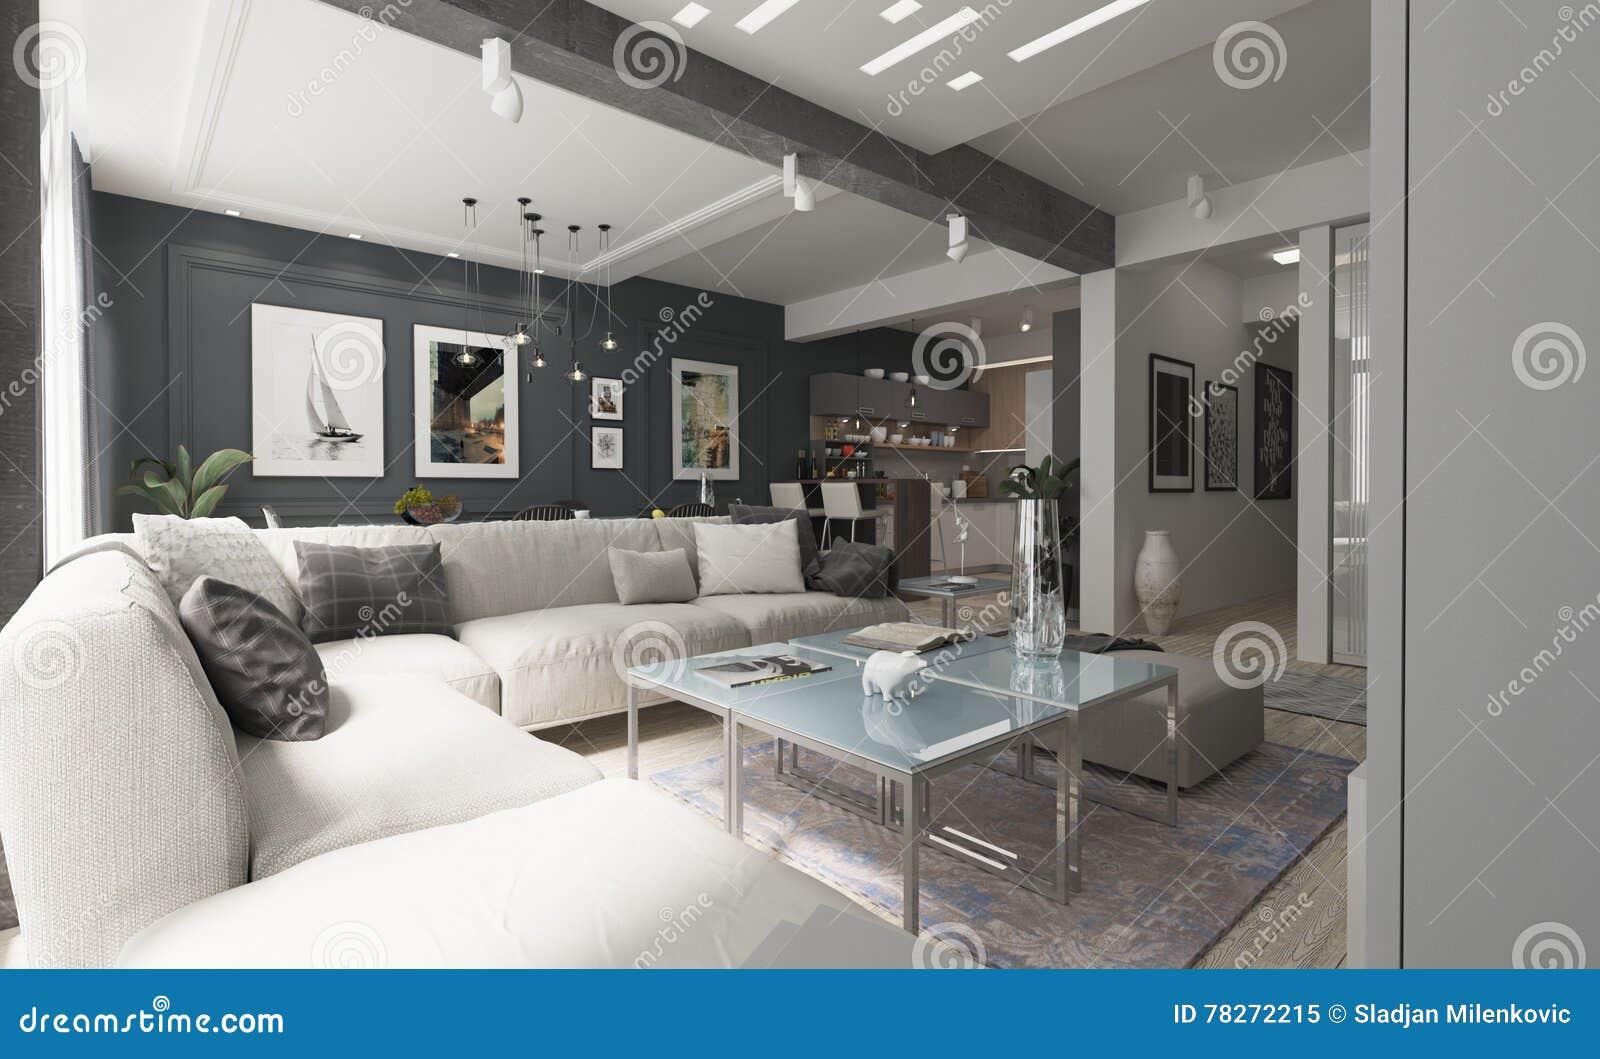 Modern Woonkamer Design : Modern living room interior design with gray walls stock image